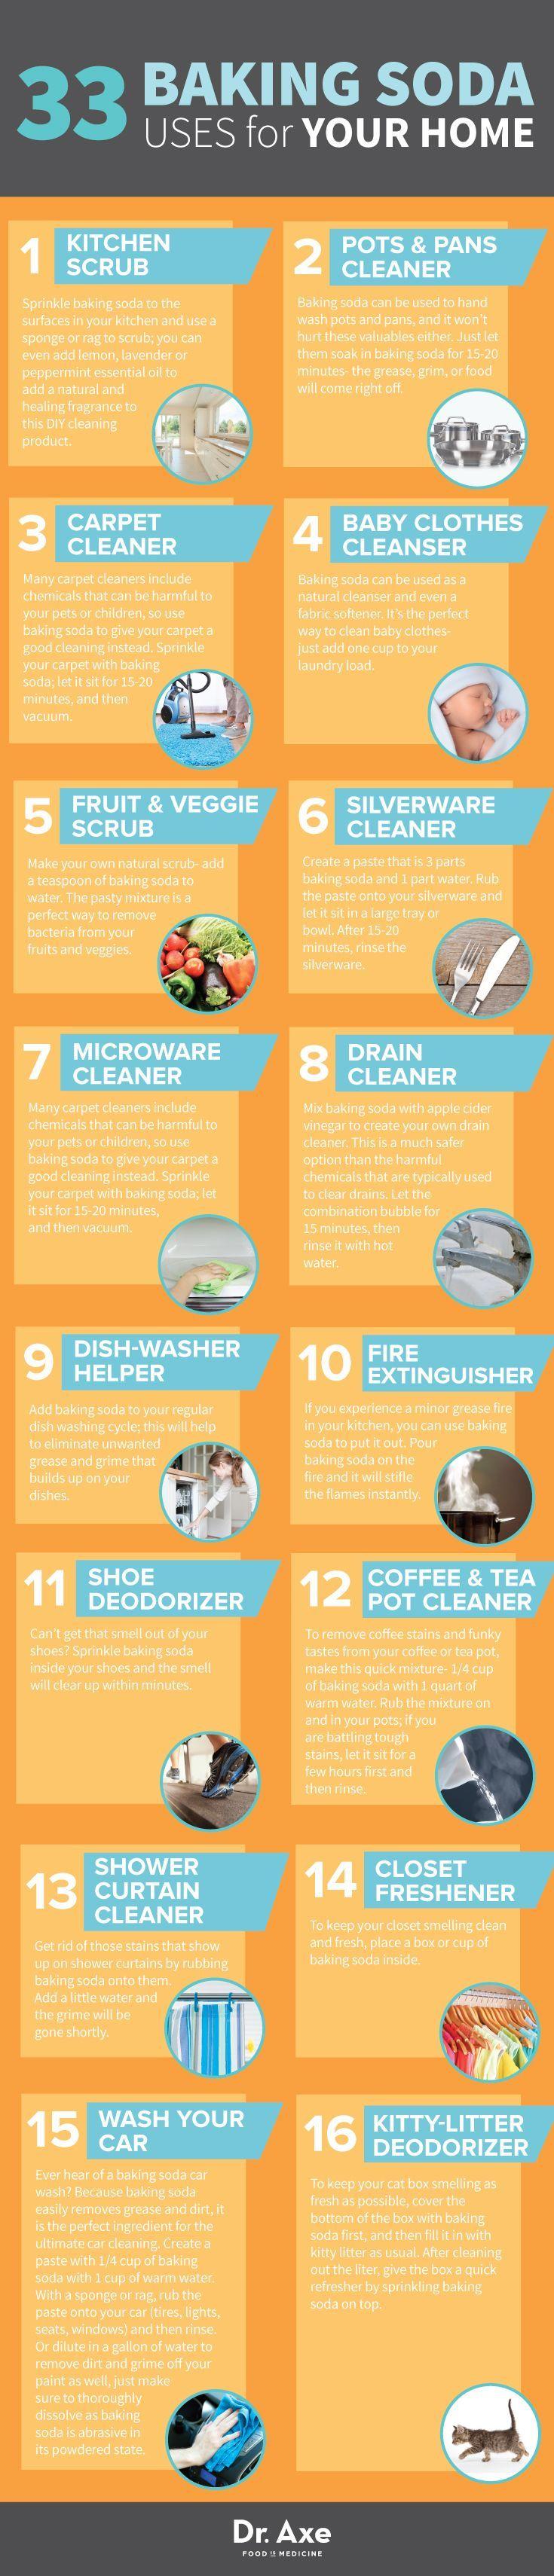 127 best baking soda health benefits images on pinterest baking